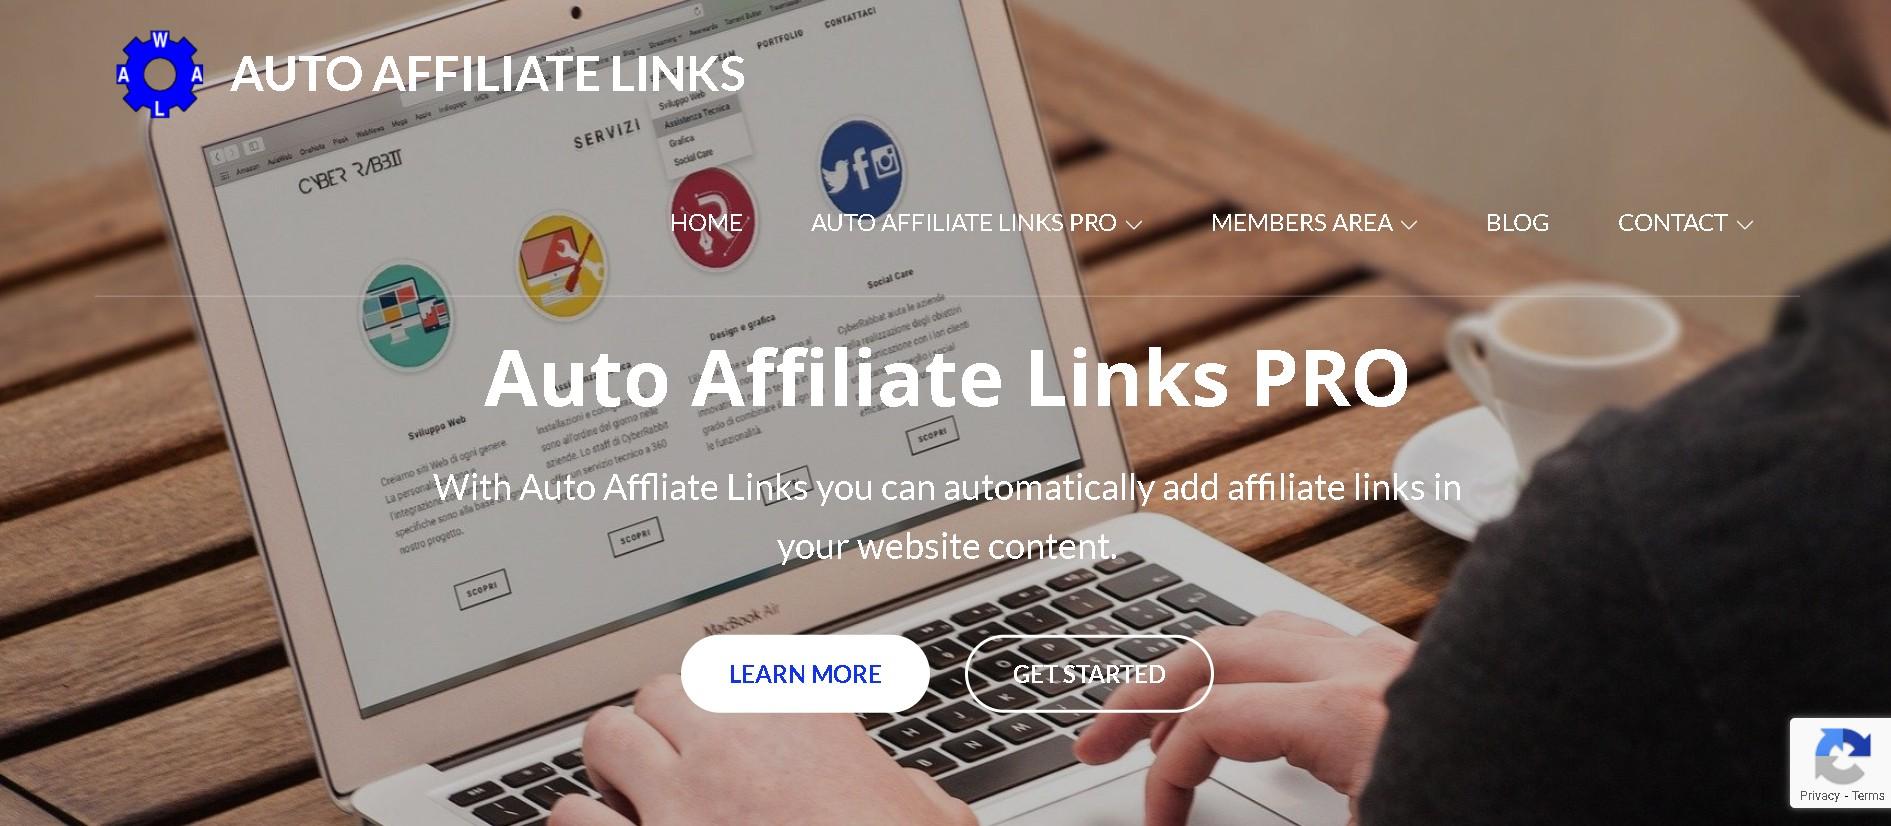 Auto affiliate links